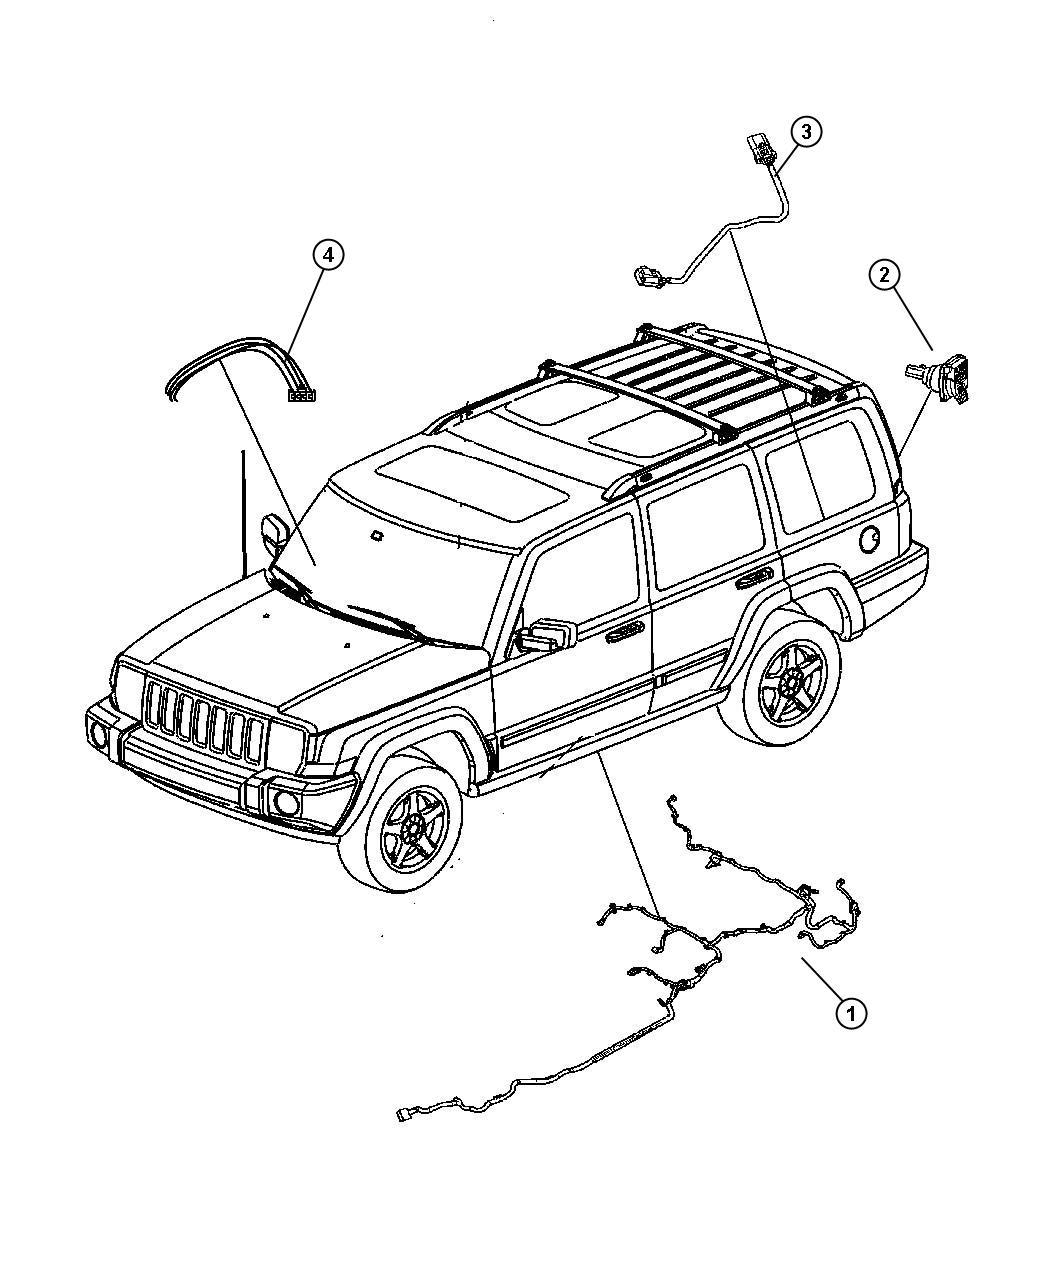 Chrysler 56038366ab wiring diagram wiring diagram and fuse box